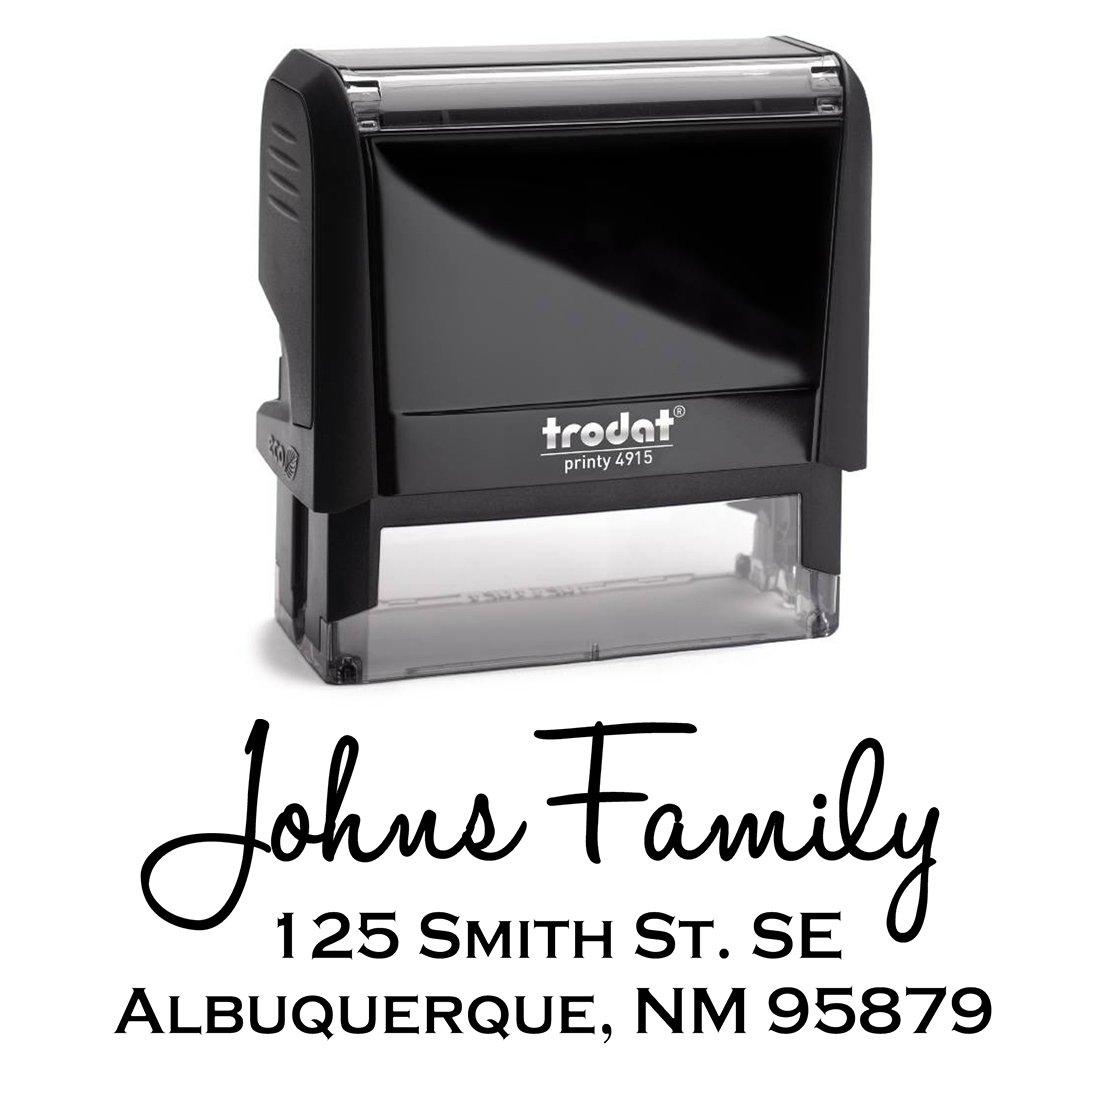 Black Self Inking Stamp Black Return Address Mail Stamper Custom Personalized Address Large 3 Lines Professional Wedding Gift Invitation Branding